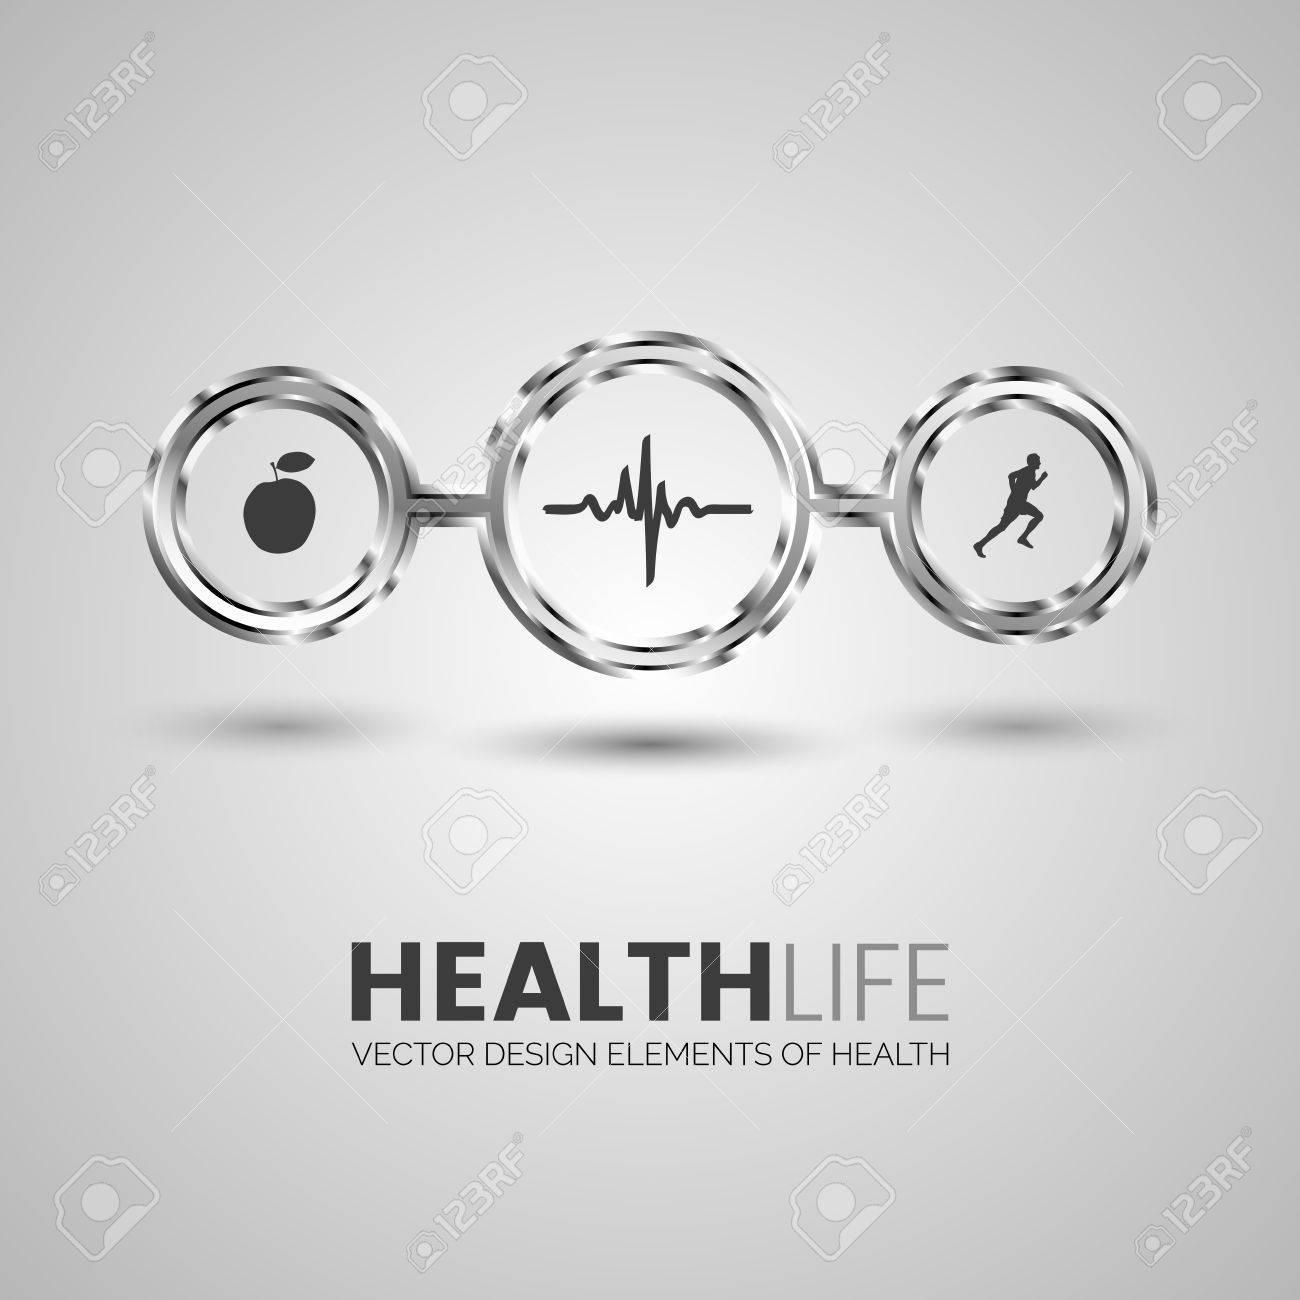 Three Health Symbols In The Chrome Circles Apple Cardiogram